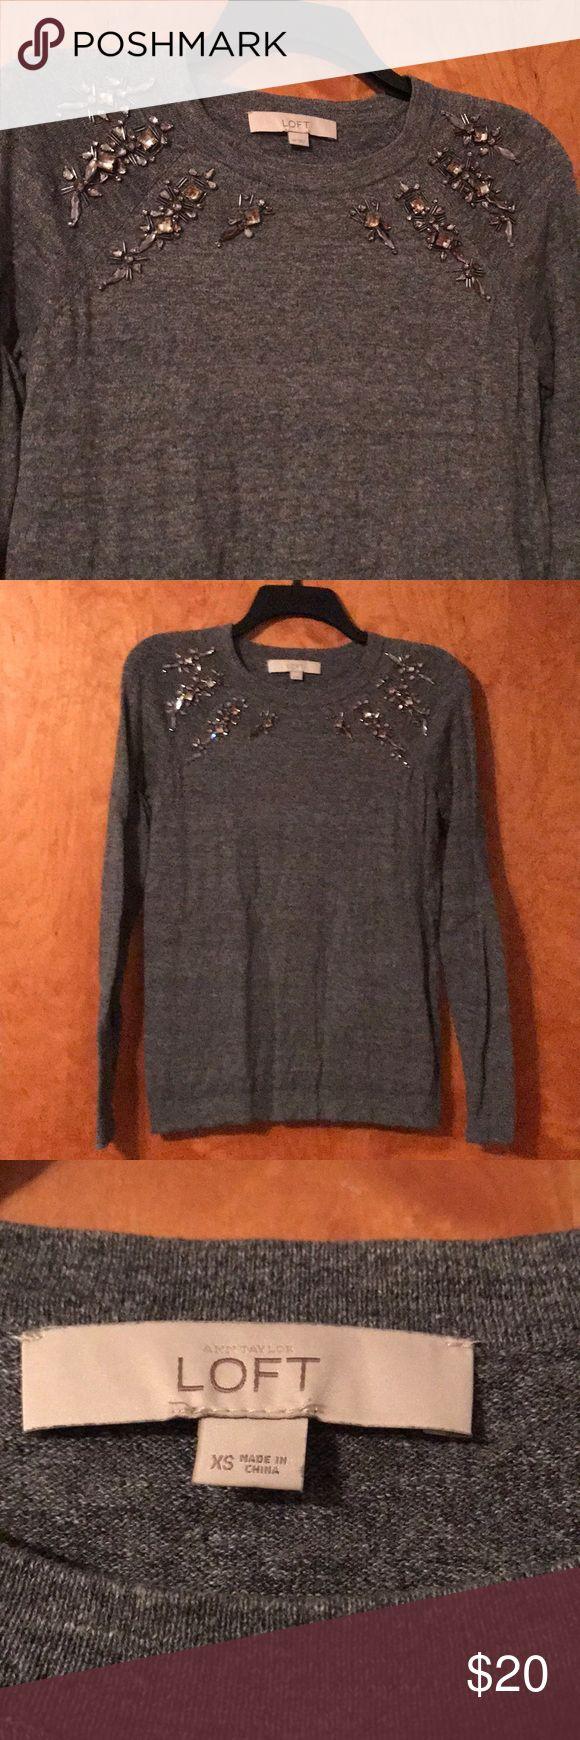 Charcoal gray Loft sweater